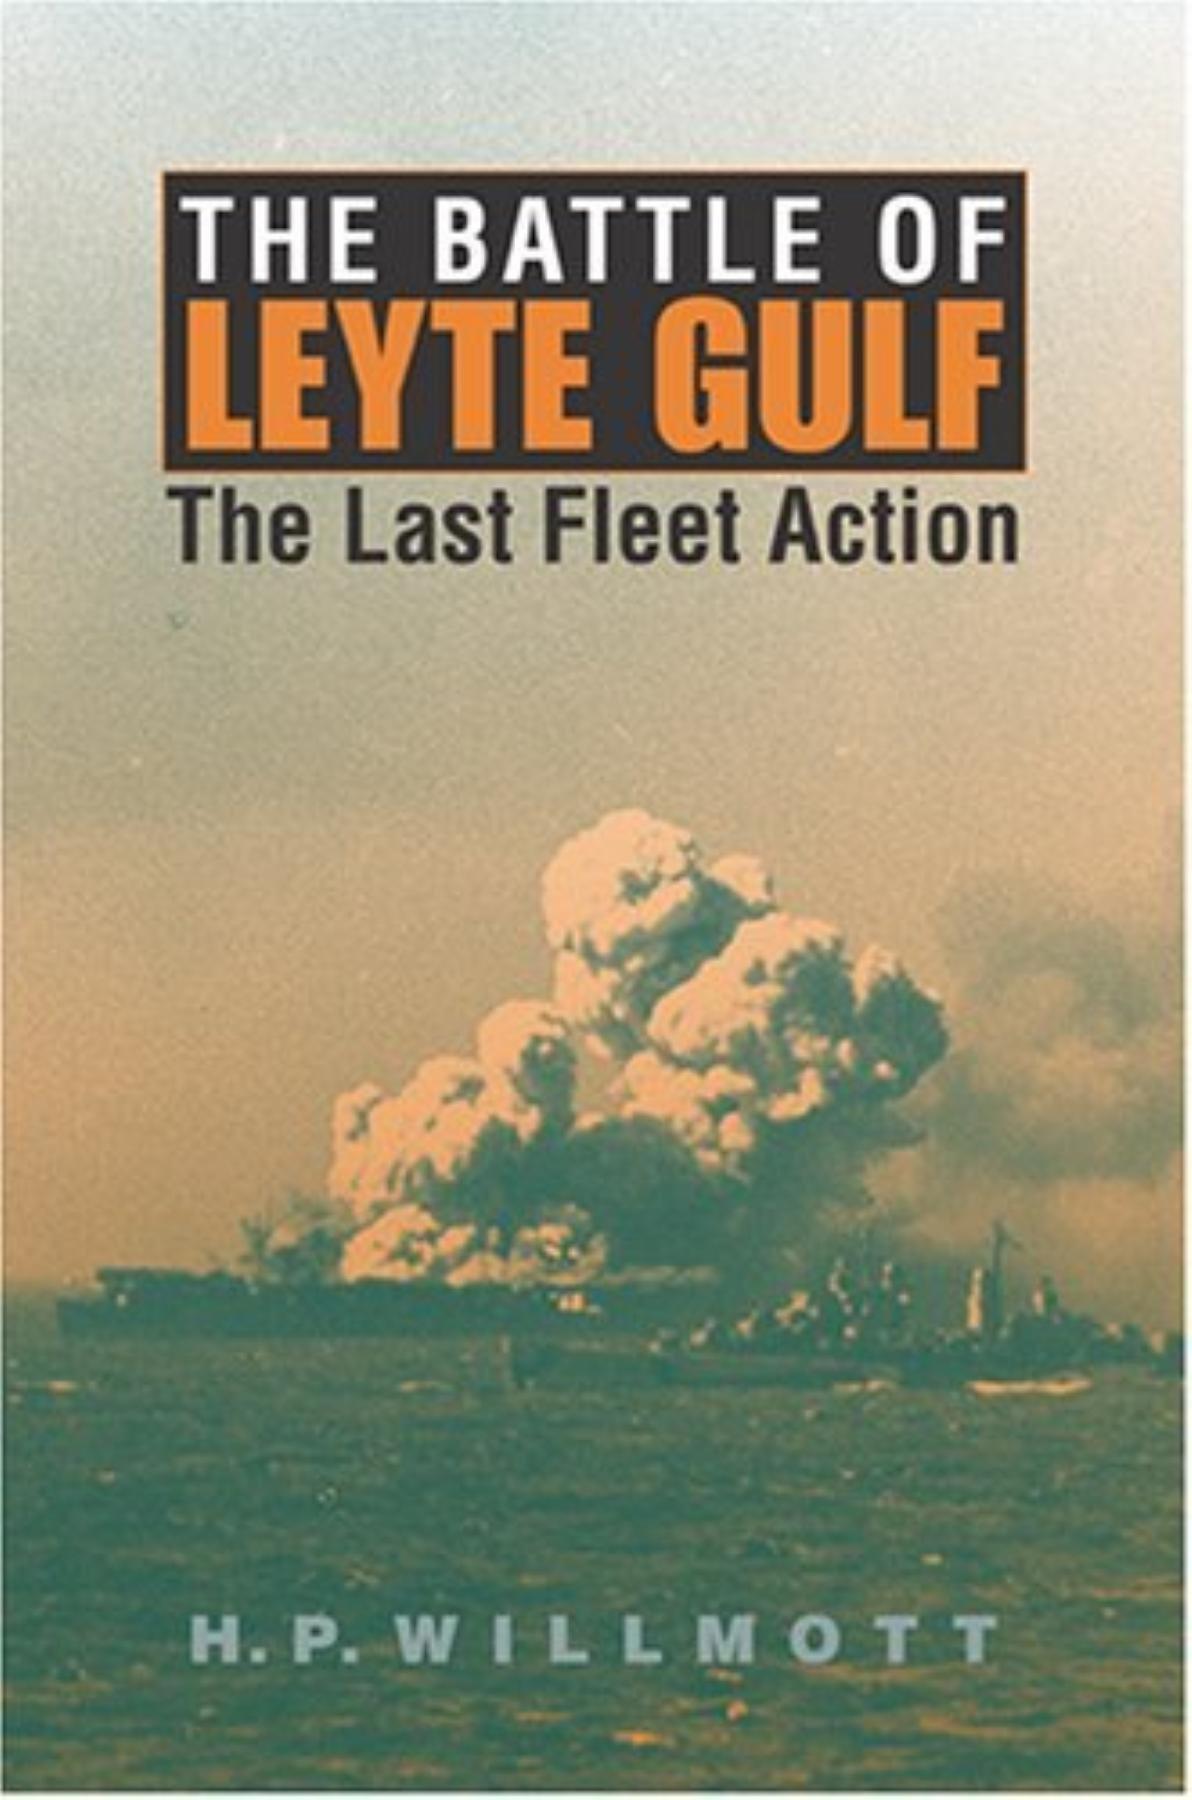 The Battle of Leyte Gulf: The Last Fleet Action (Twentieth-Century Battles) ebook